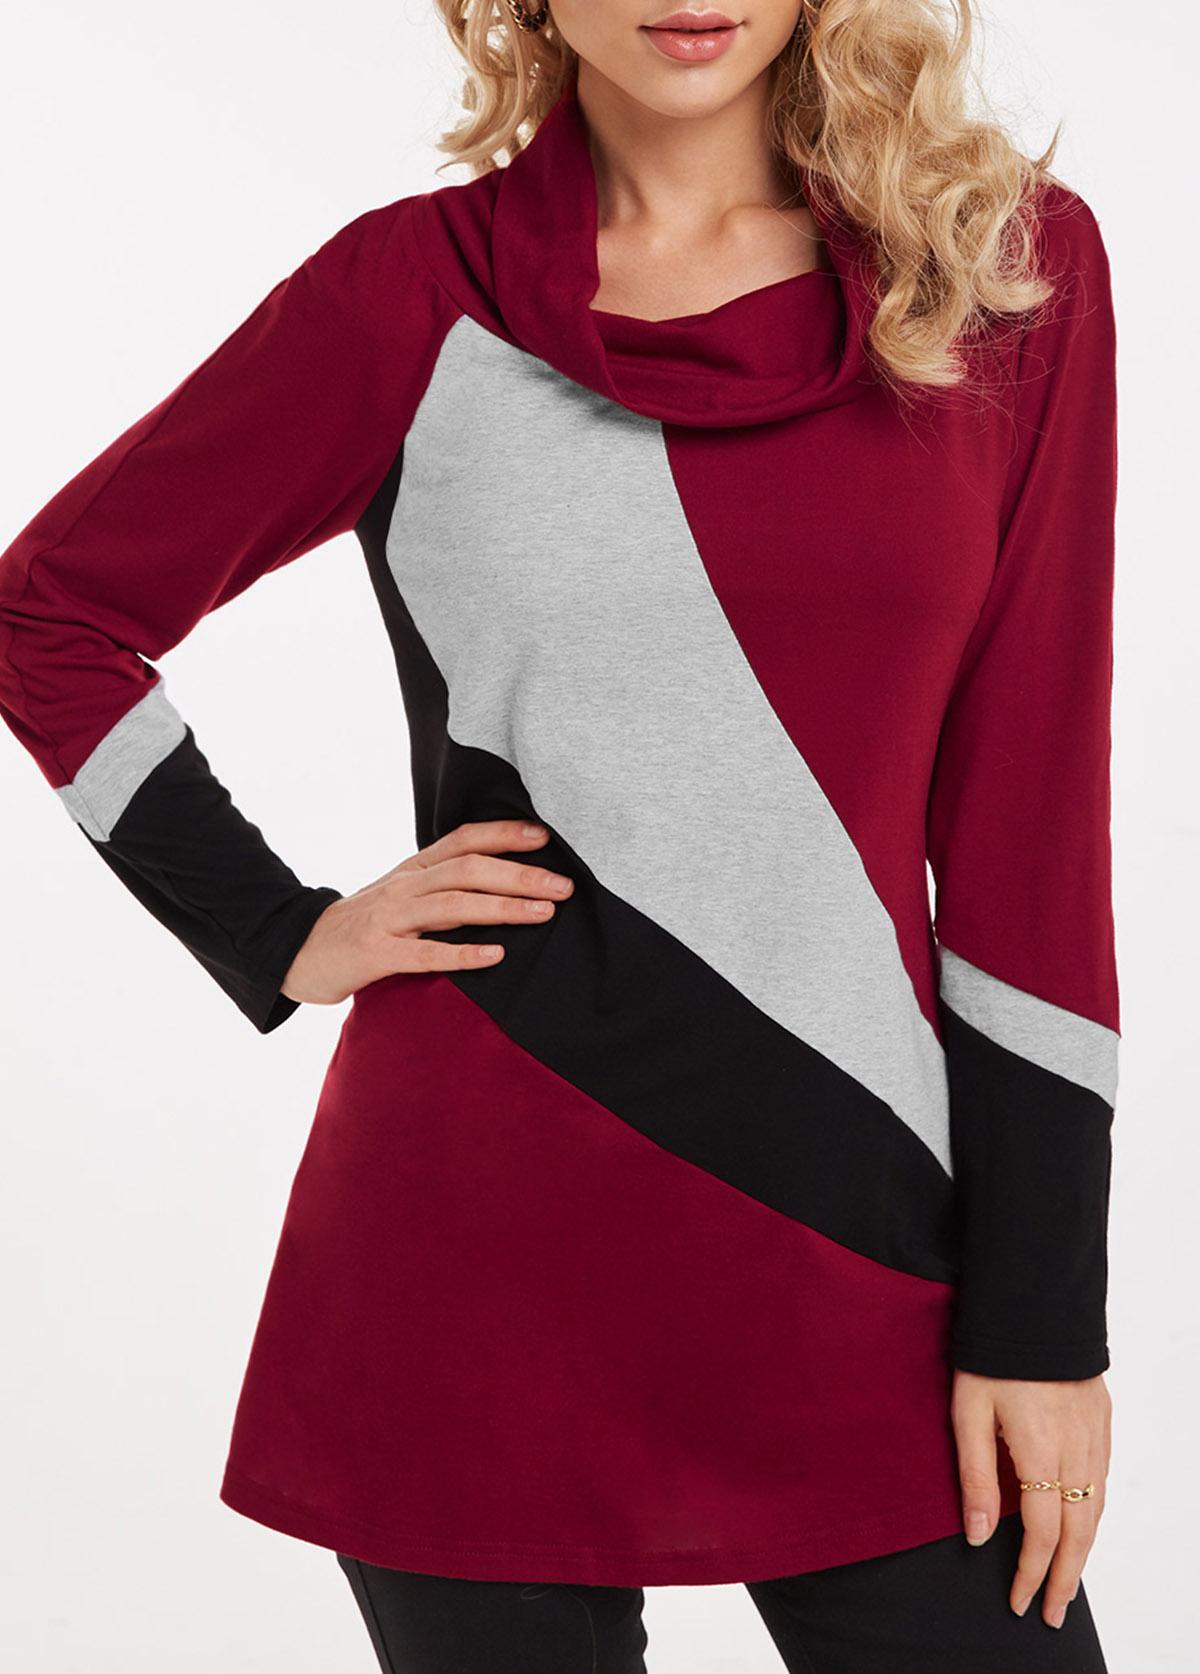 ROTITA Contrast Cowl Neck Long Sleeve Tunic Top